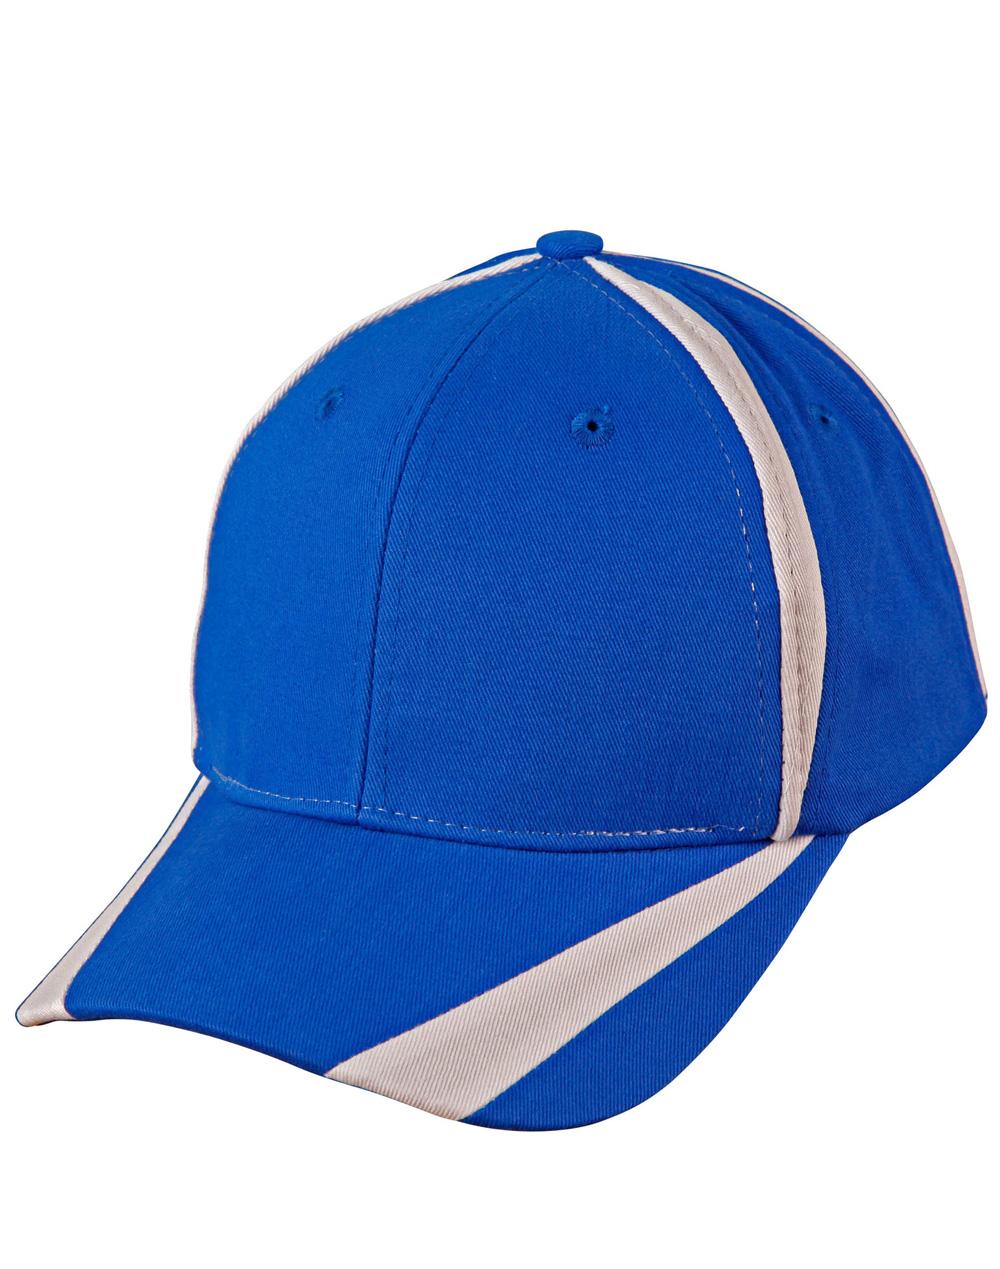 CH81 PEAK & CROWN CONTRAST CAP – Key Promotional Products